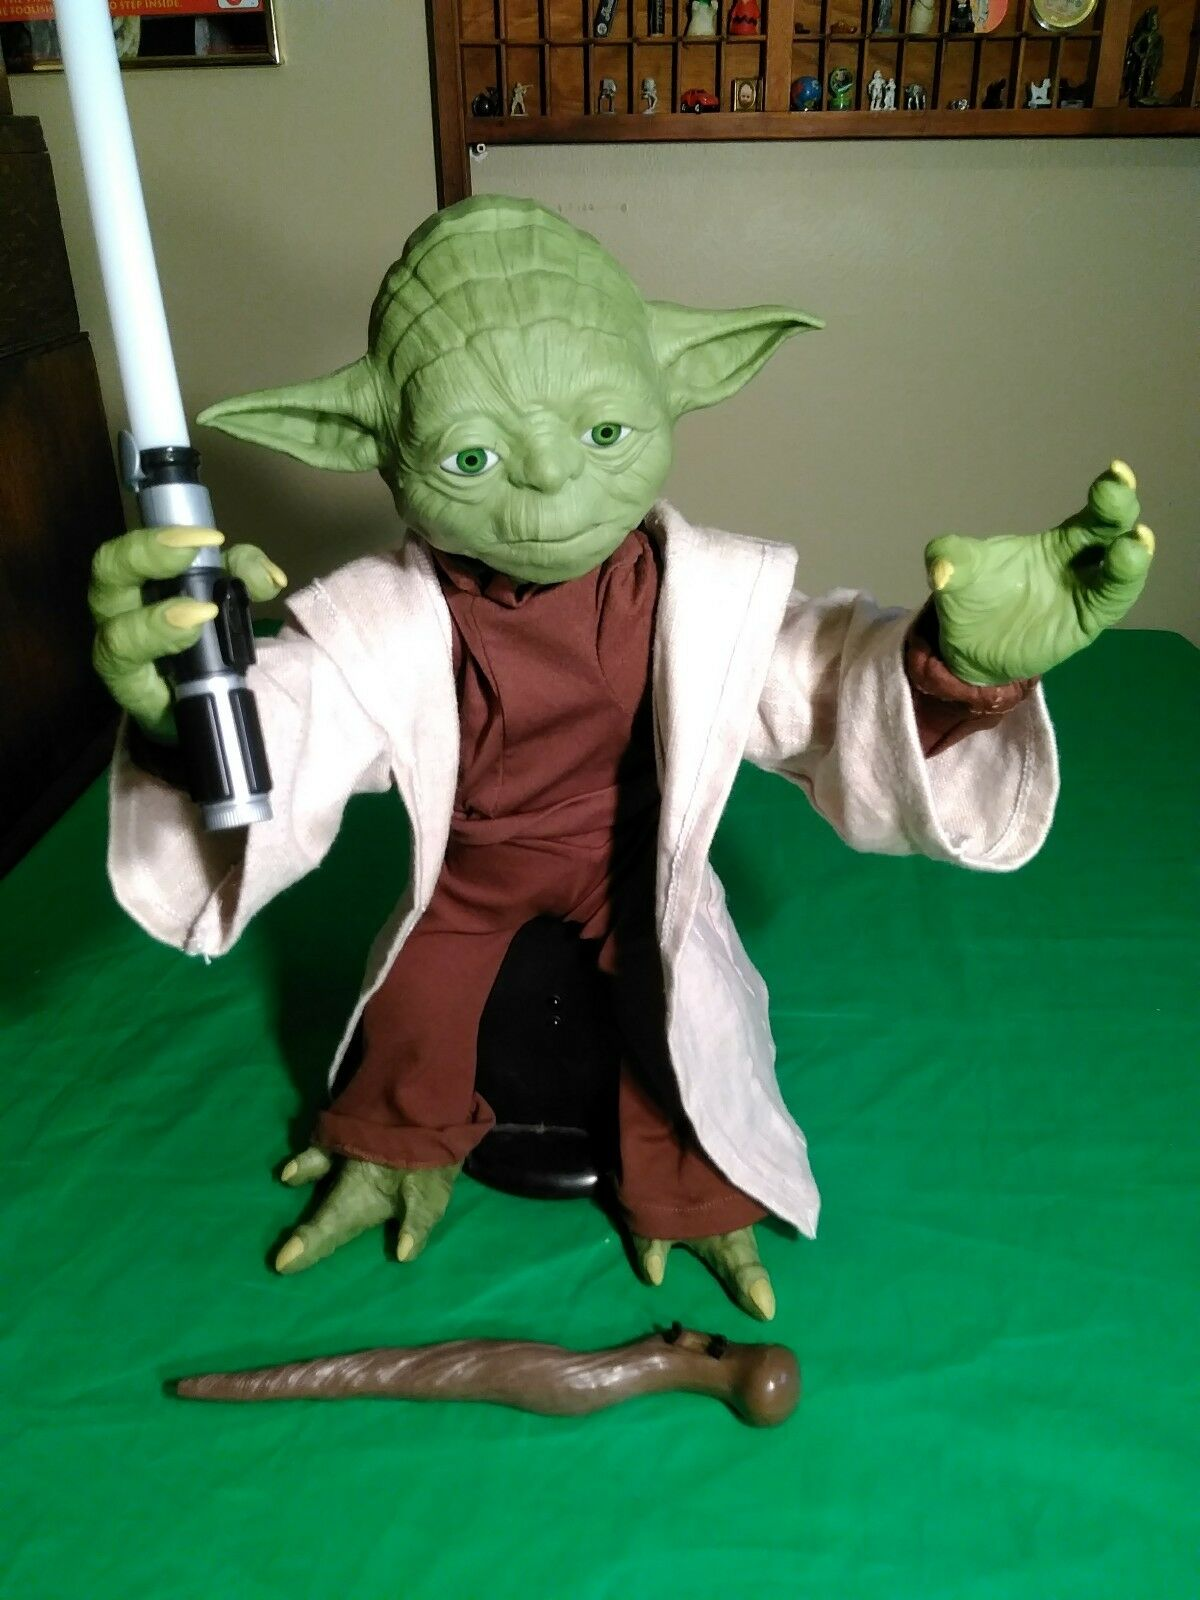 Star Wars Legendary Jedi Master Yoda Interactive Talking Action Figure